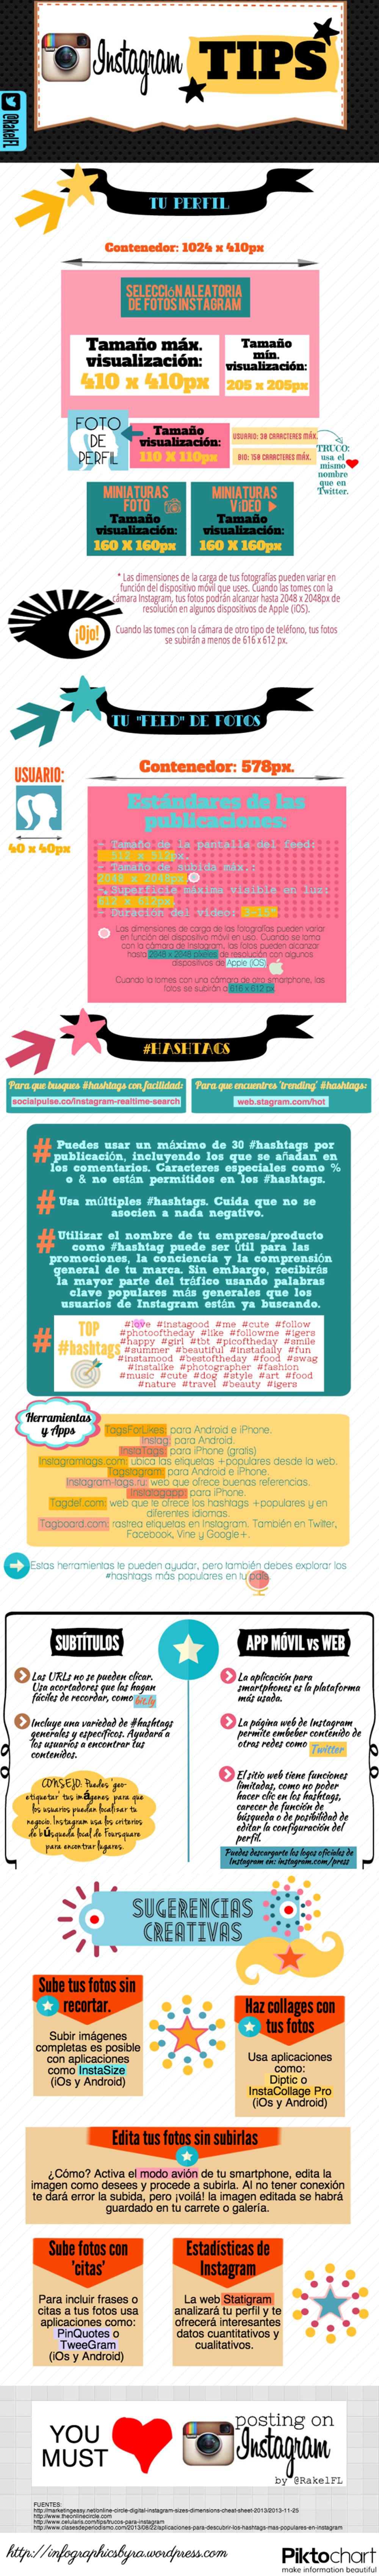 instagram-tips-infographic